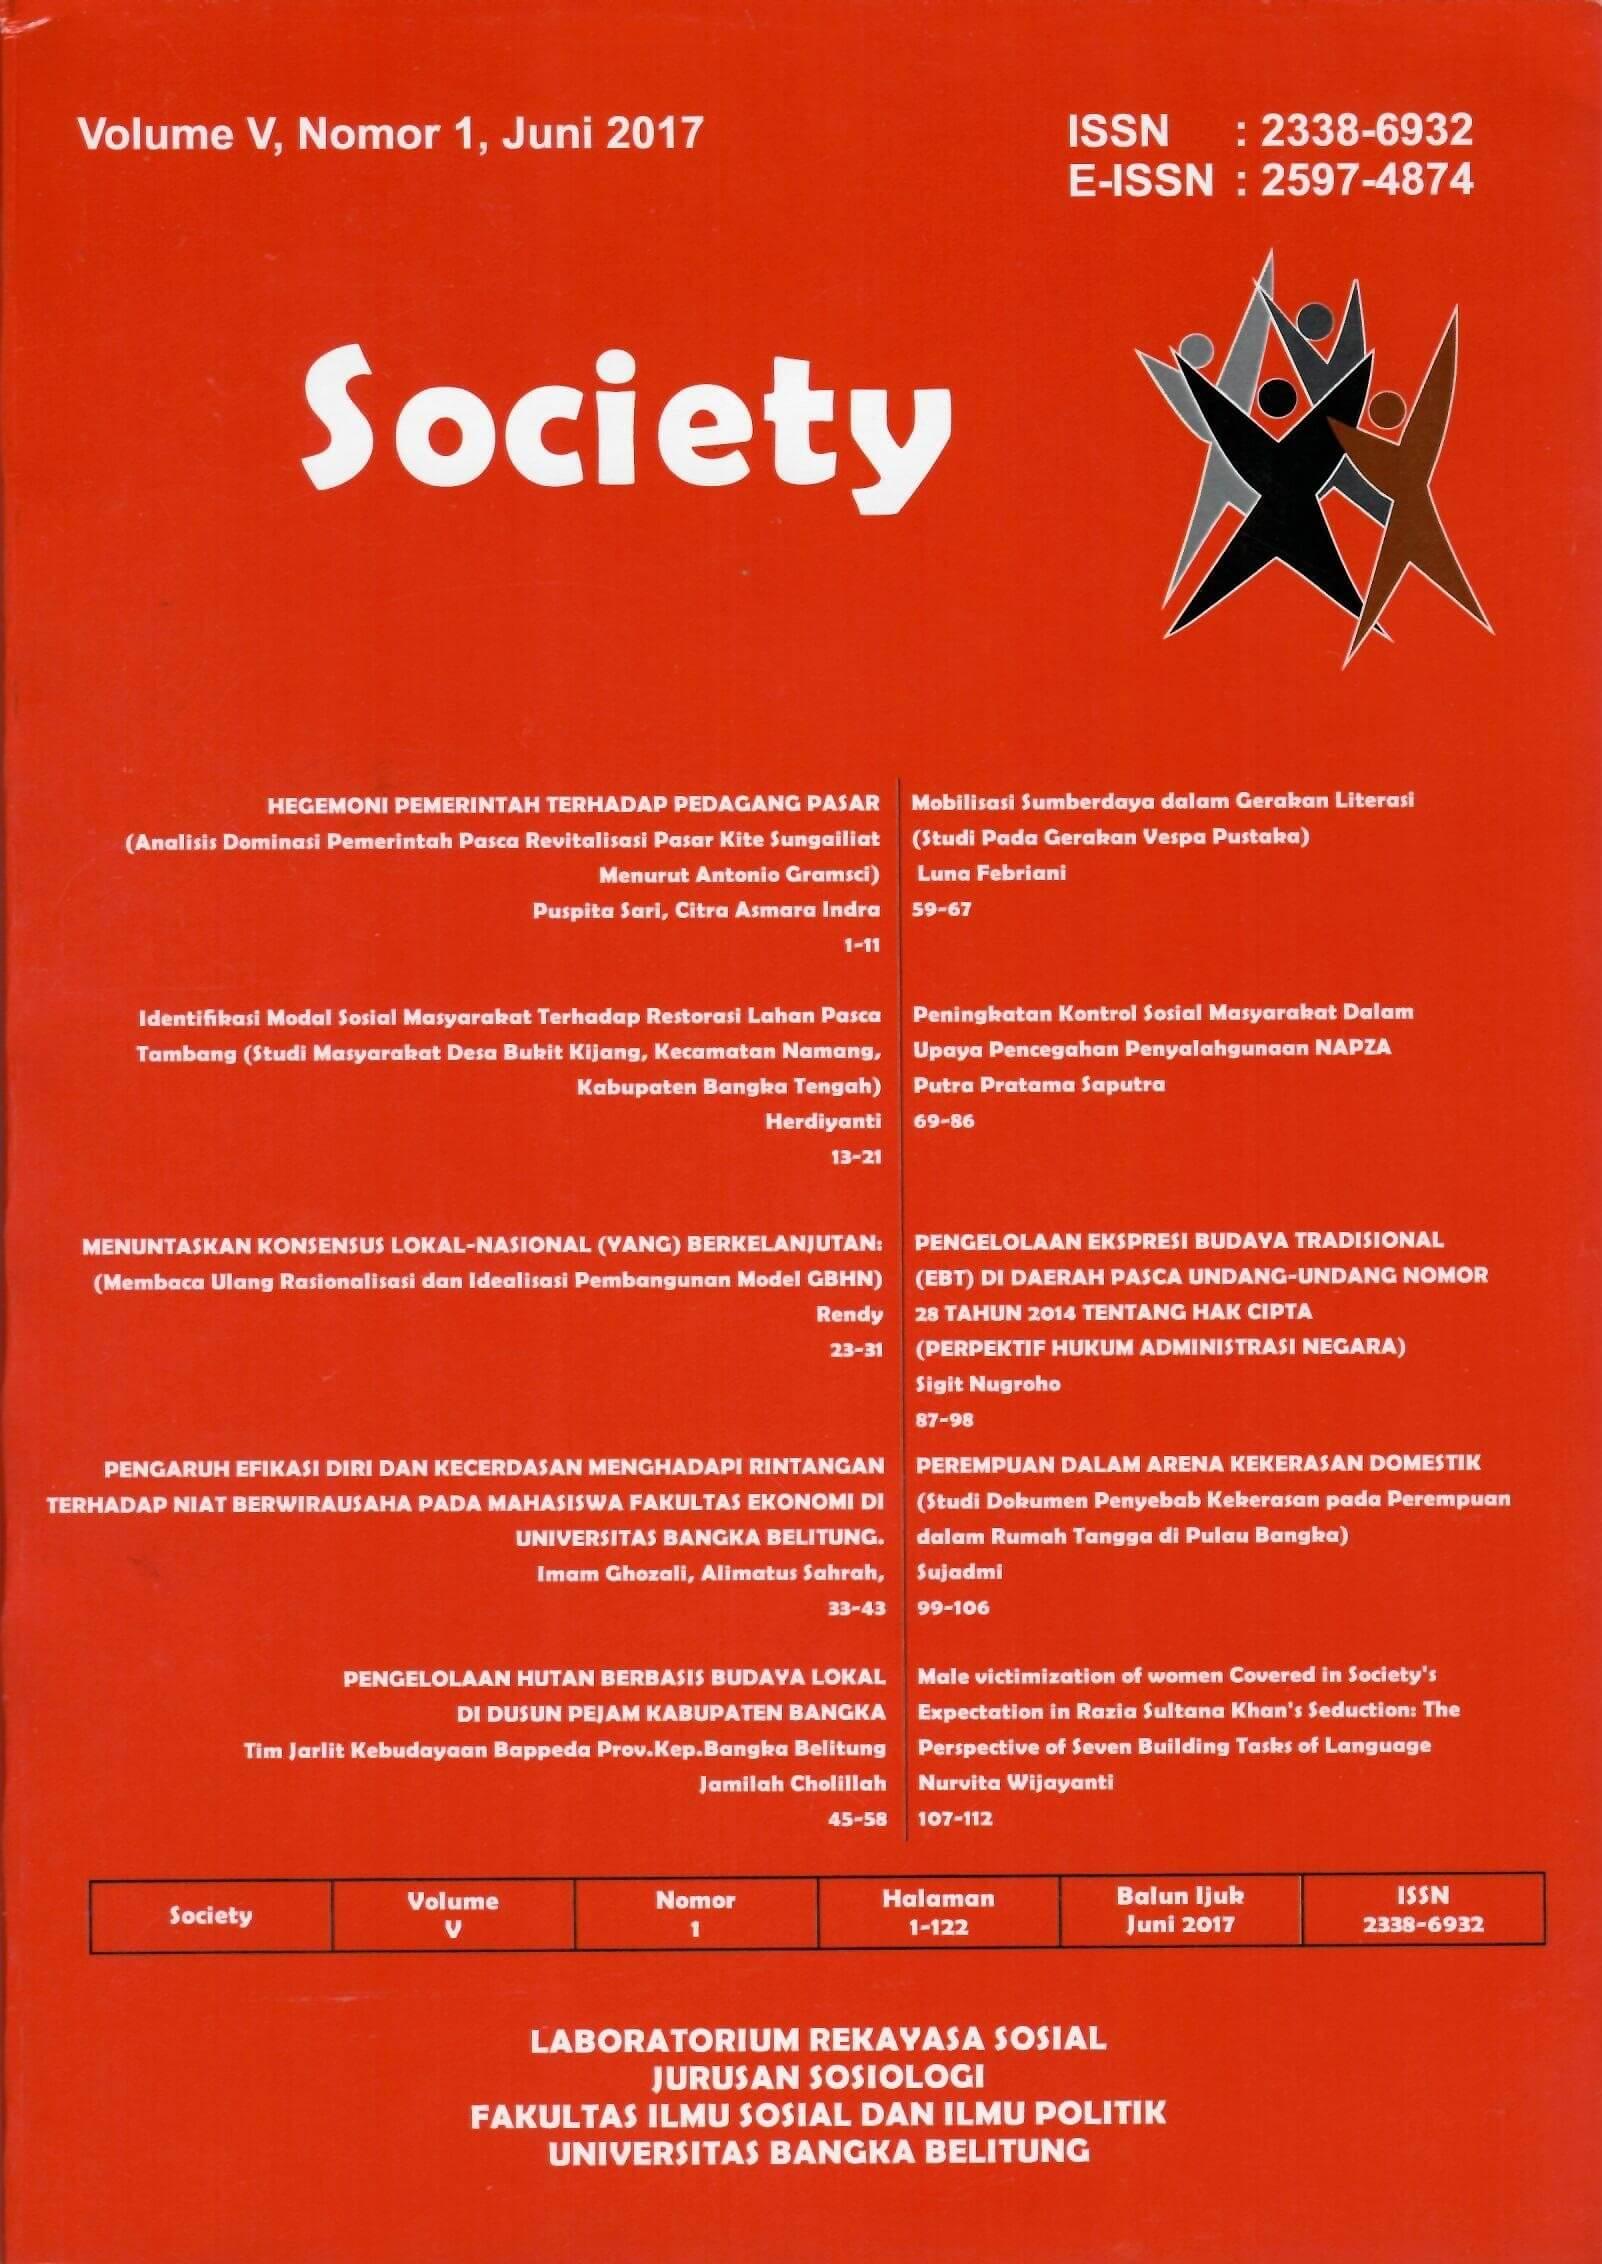 Jurnal Society Volume 5 Nomor 1#Juni 2017